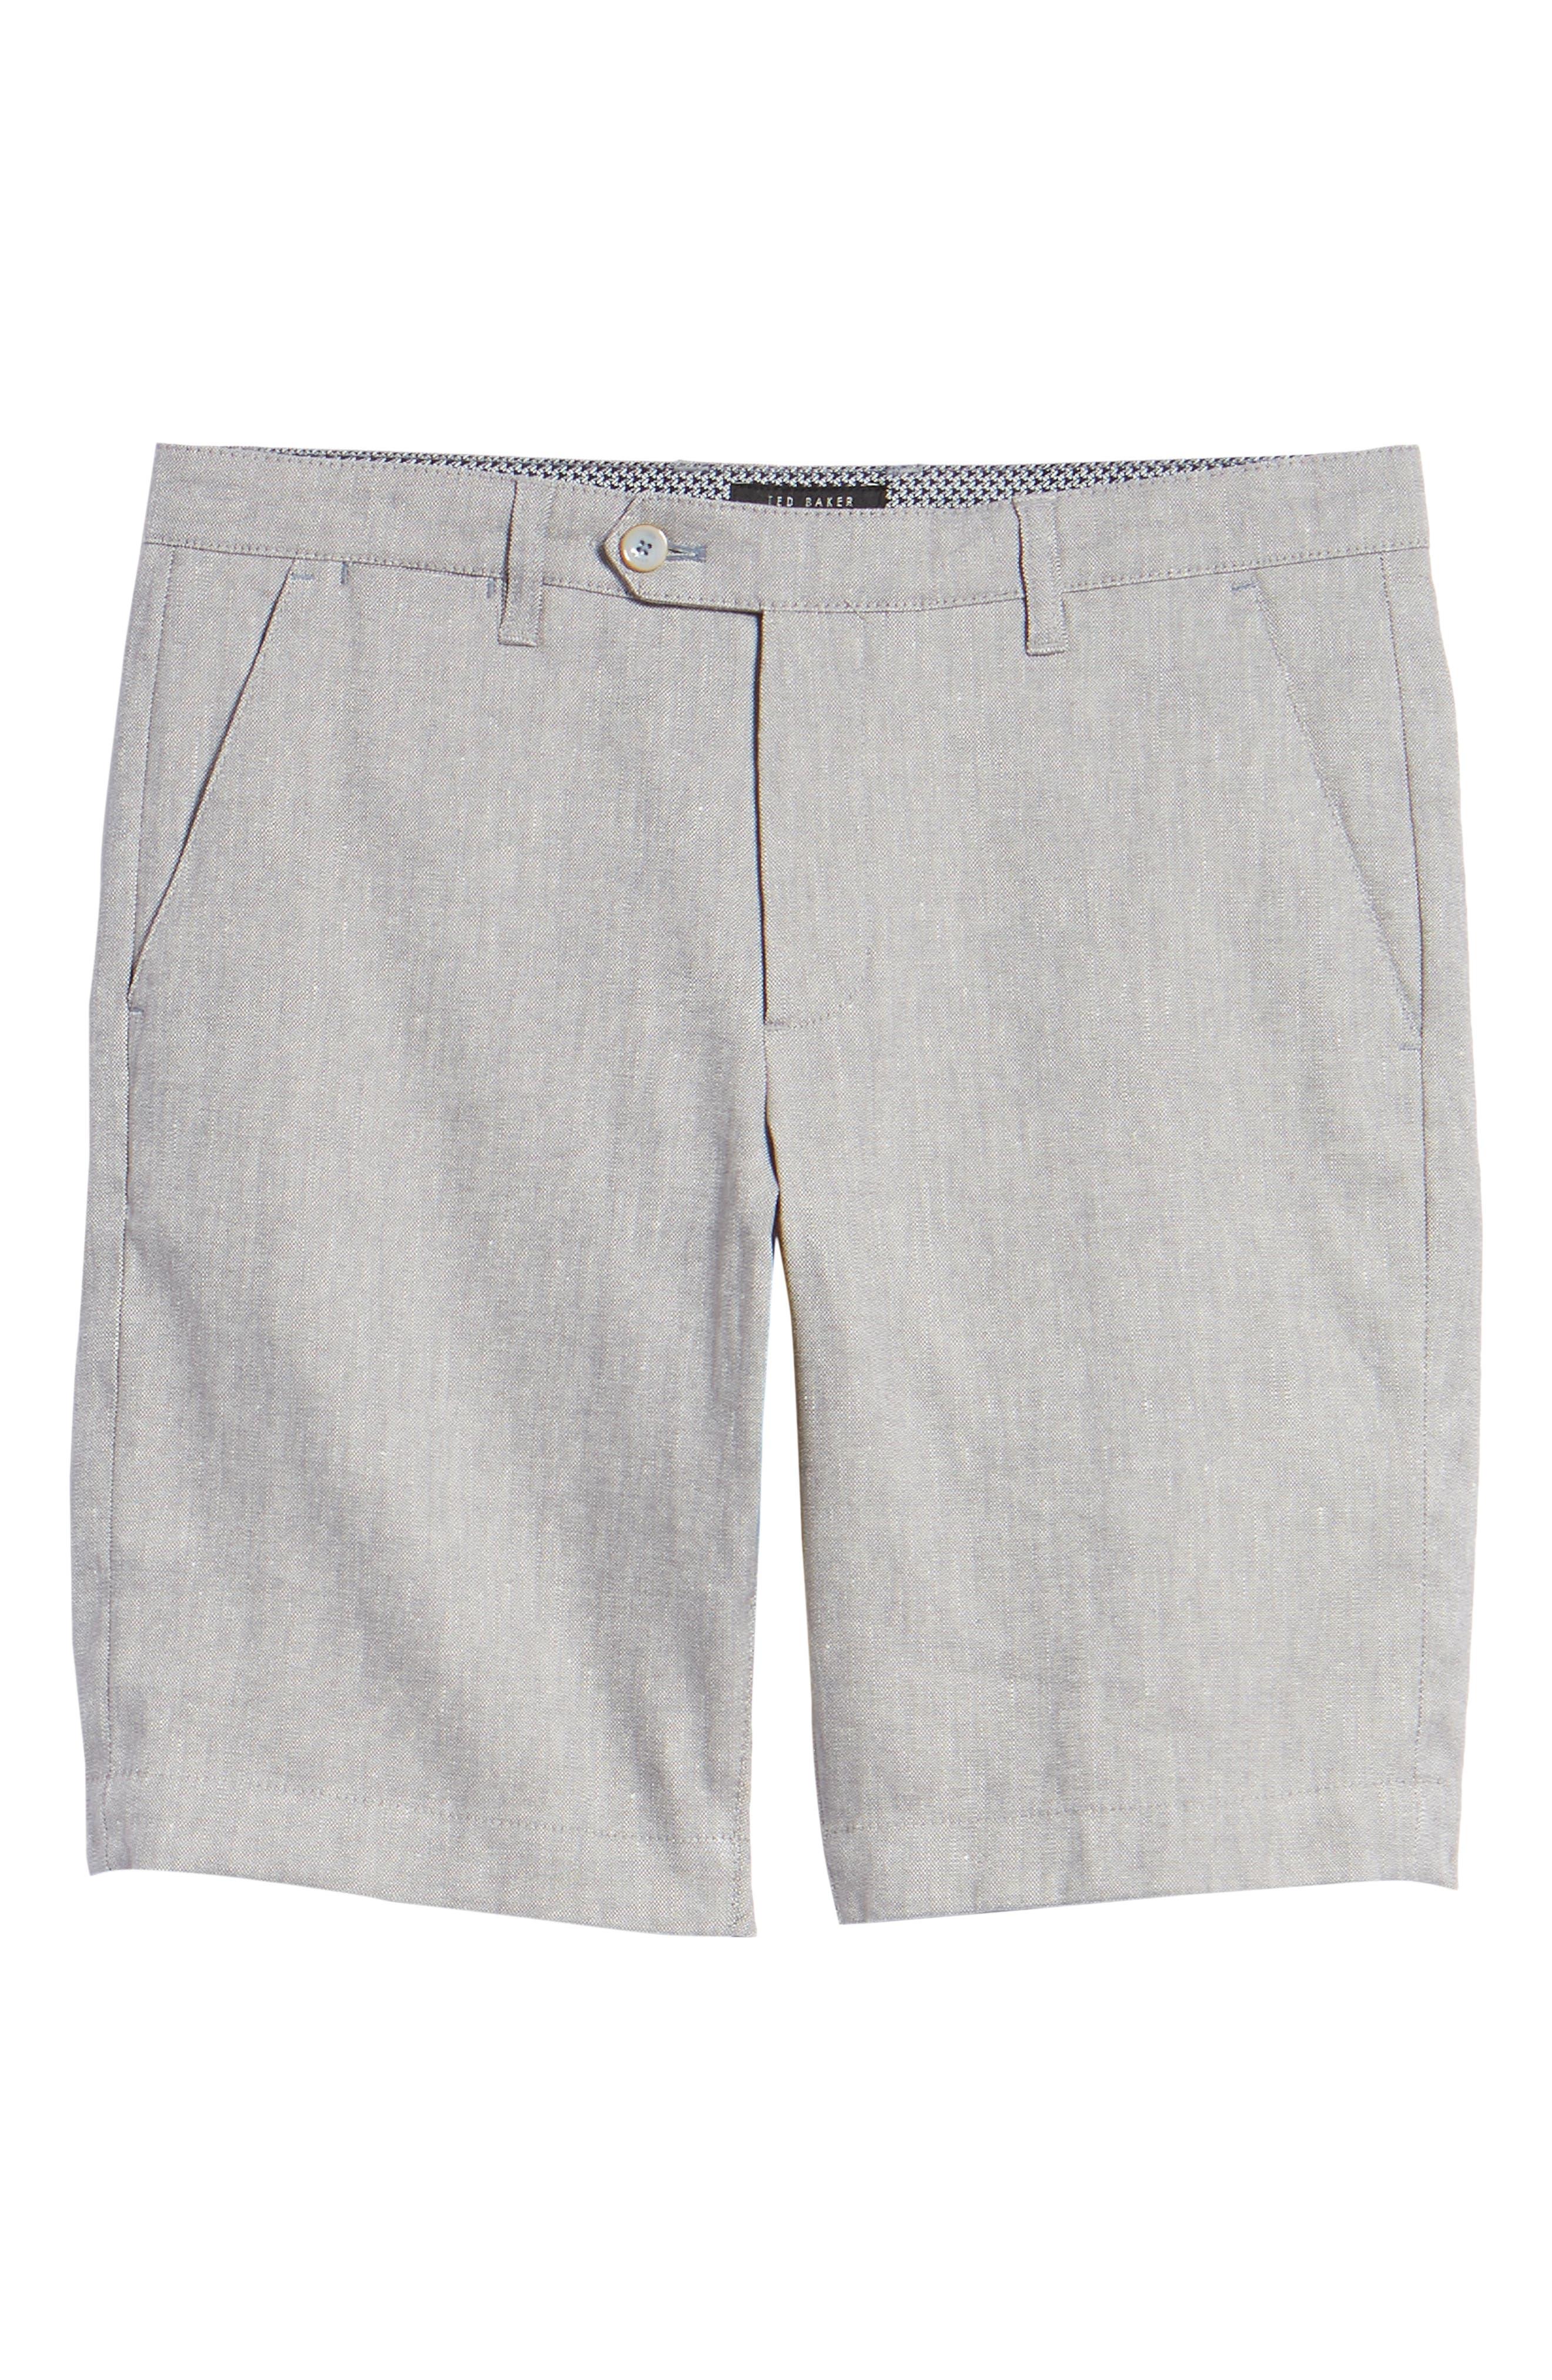 Newshow Flat Front Stretch Cotton Blend Shorts,                             Alternate thumbnail 6, color,                             GREY